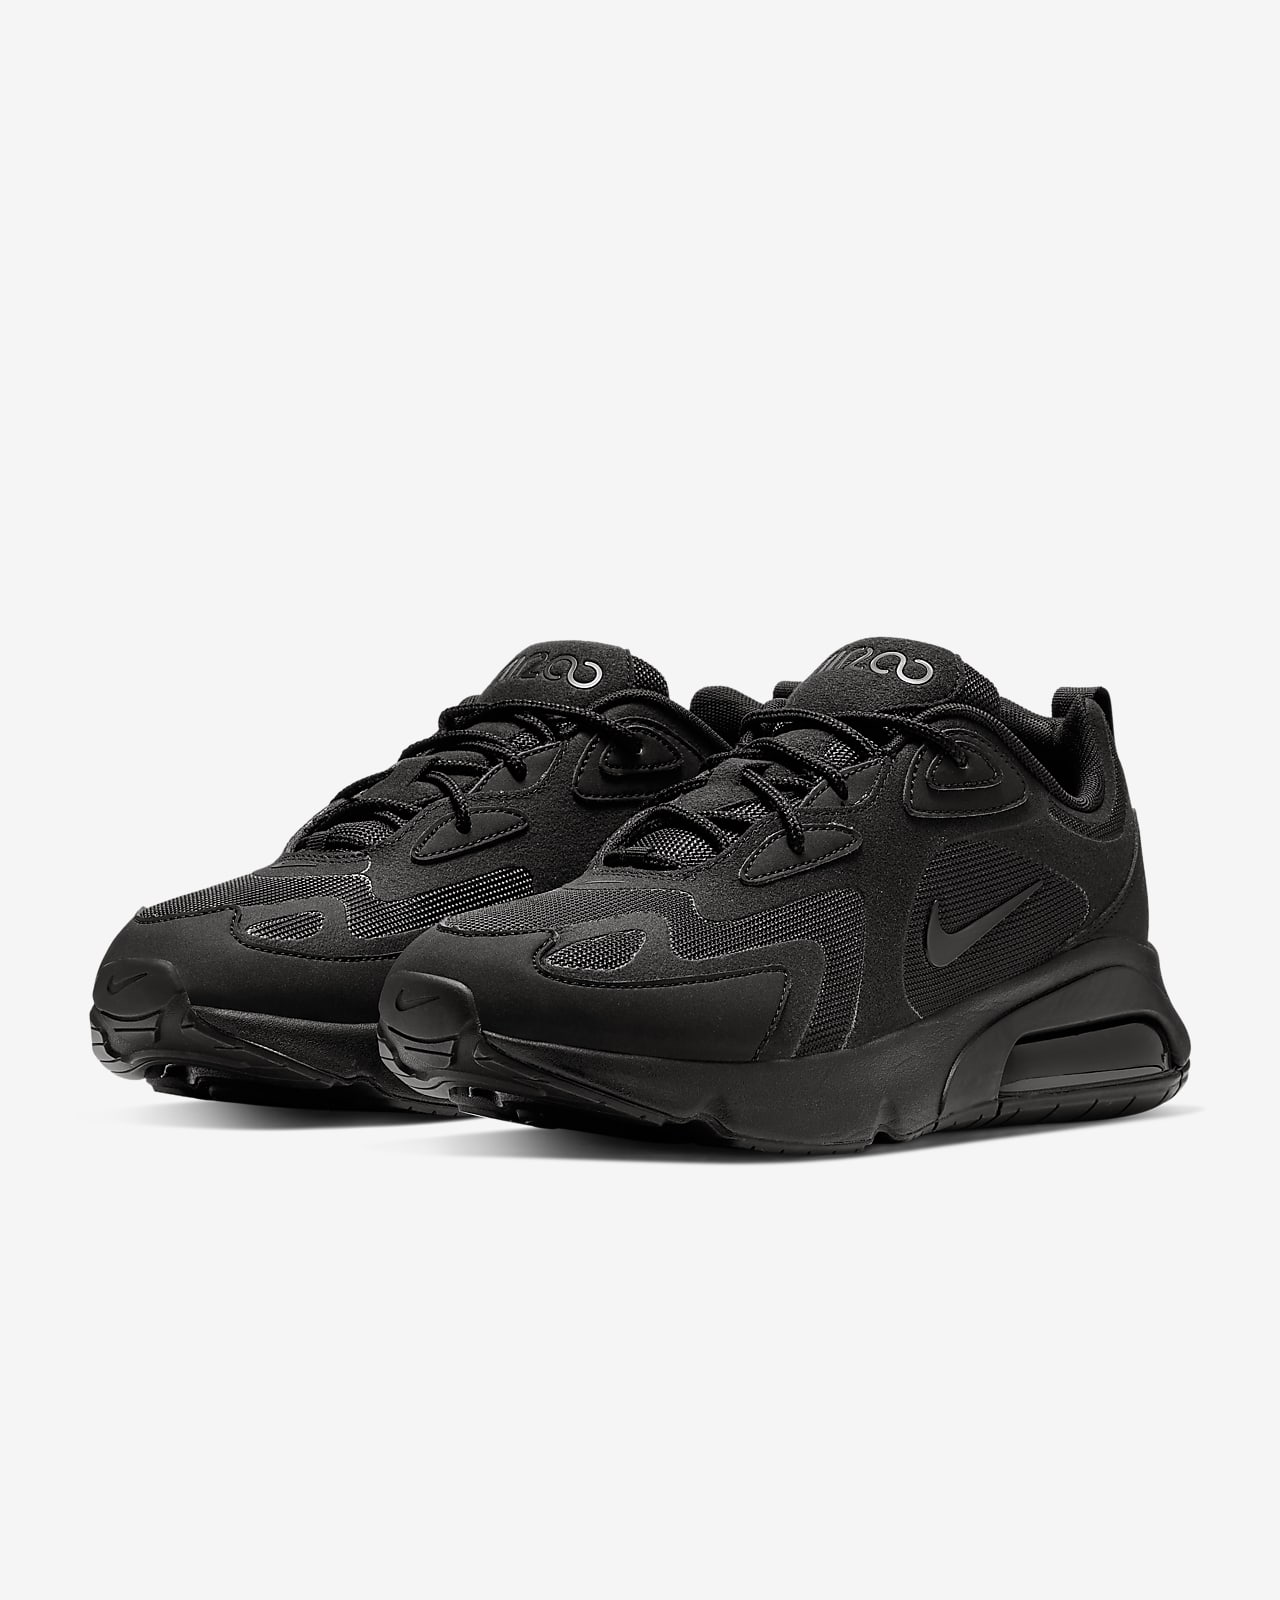 Calzado para hombre Nike Air Max 200